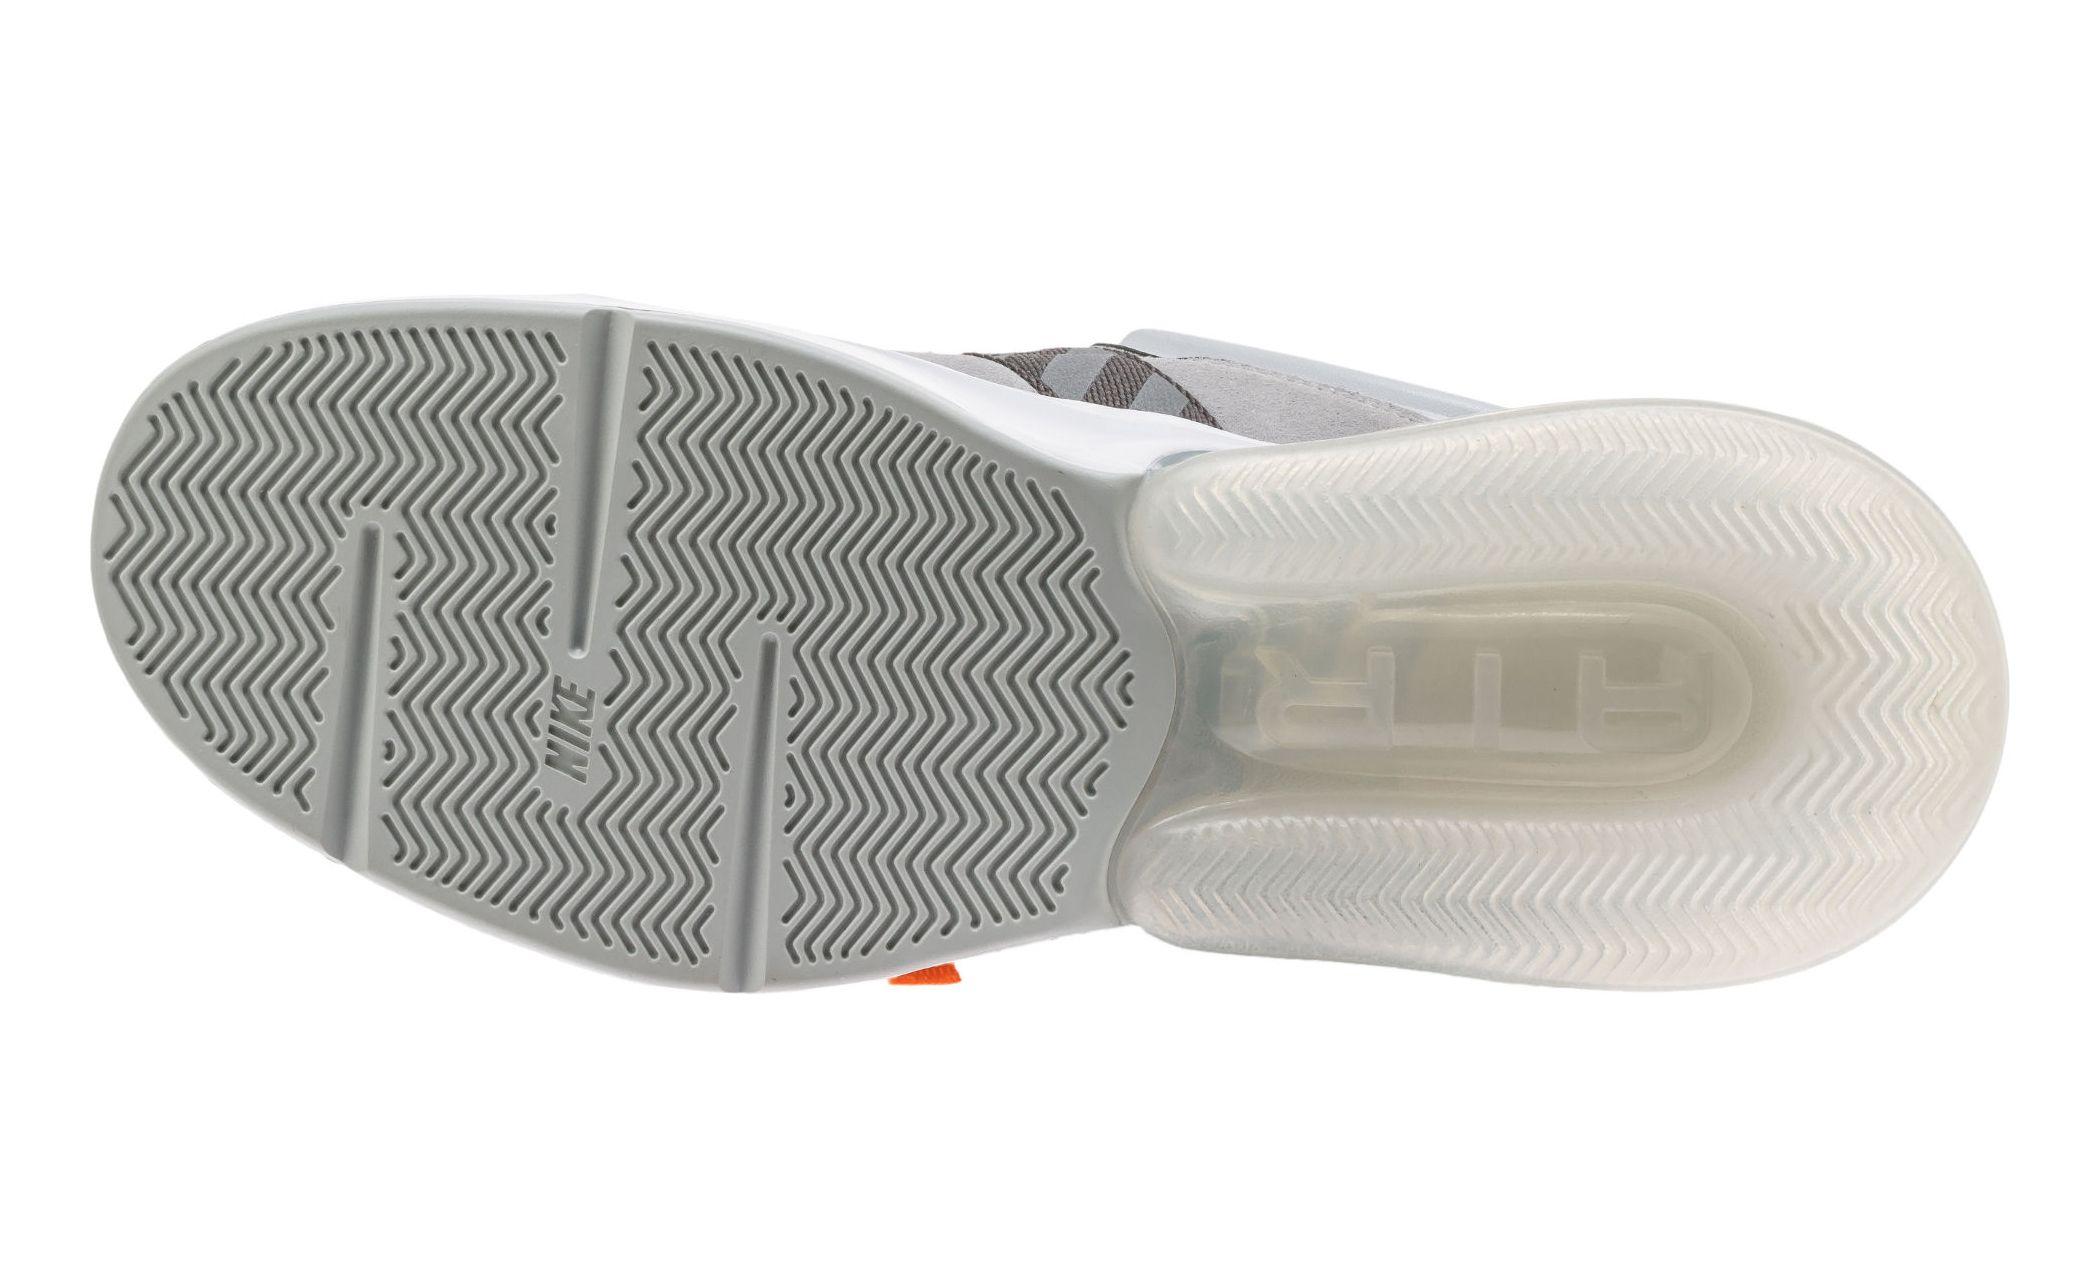 Nike Air Force 270 5 Sneaker Freaker